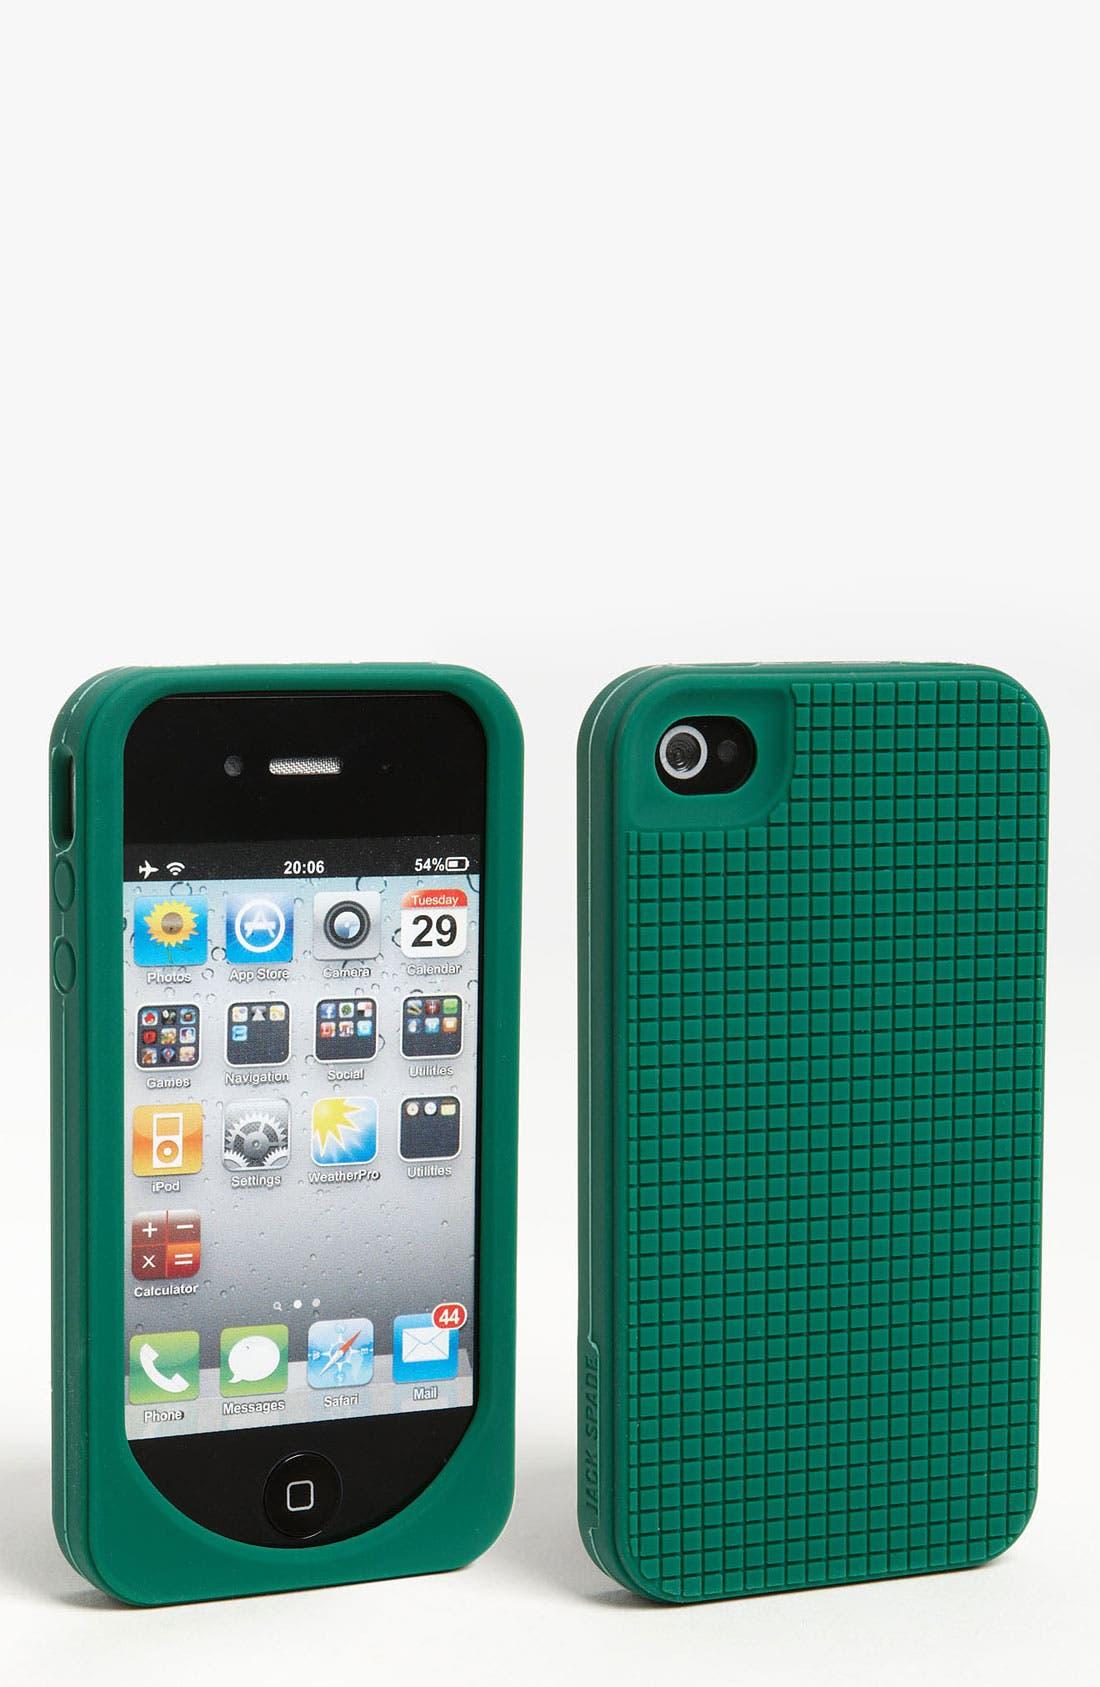 Main Image - Jack Spade 'Grid' iPhone 4 & 4S Case